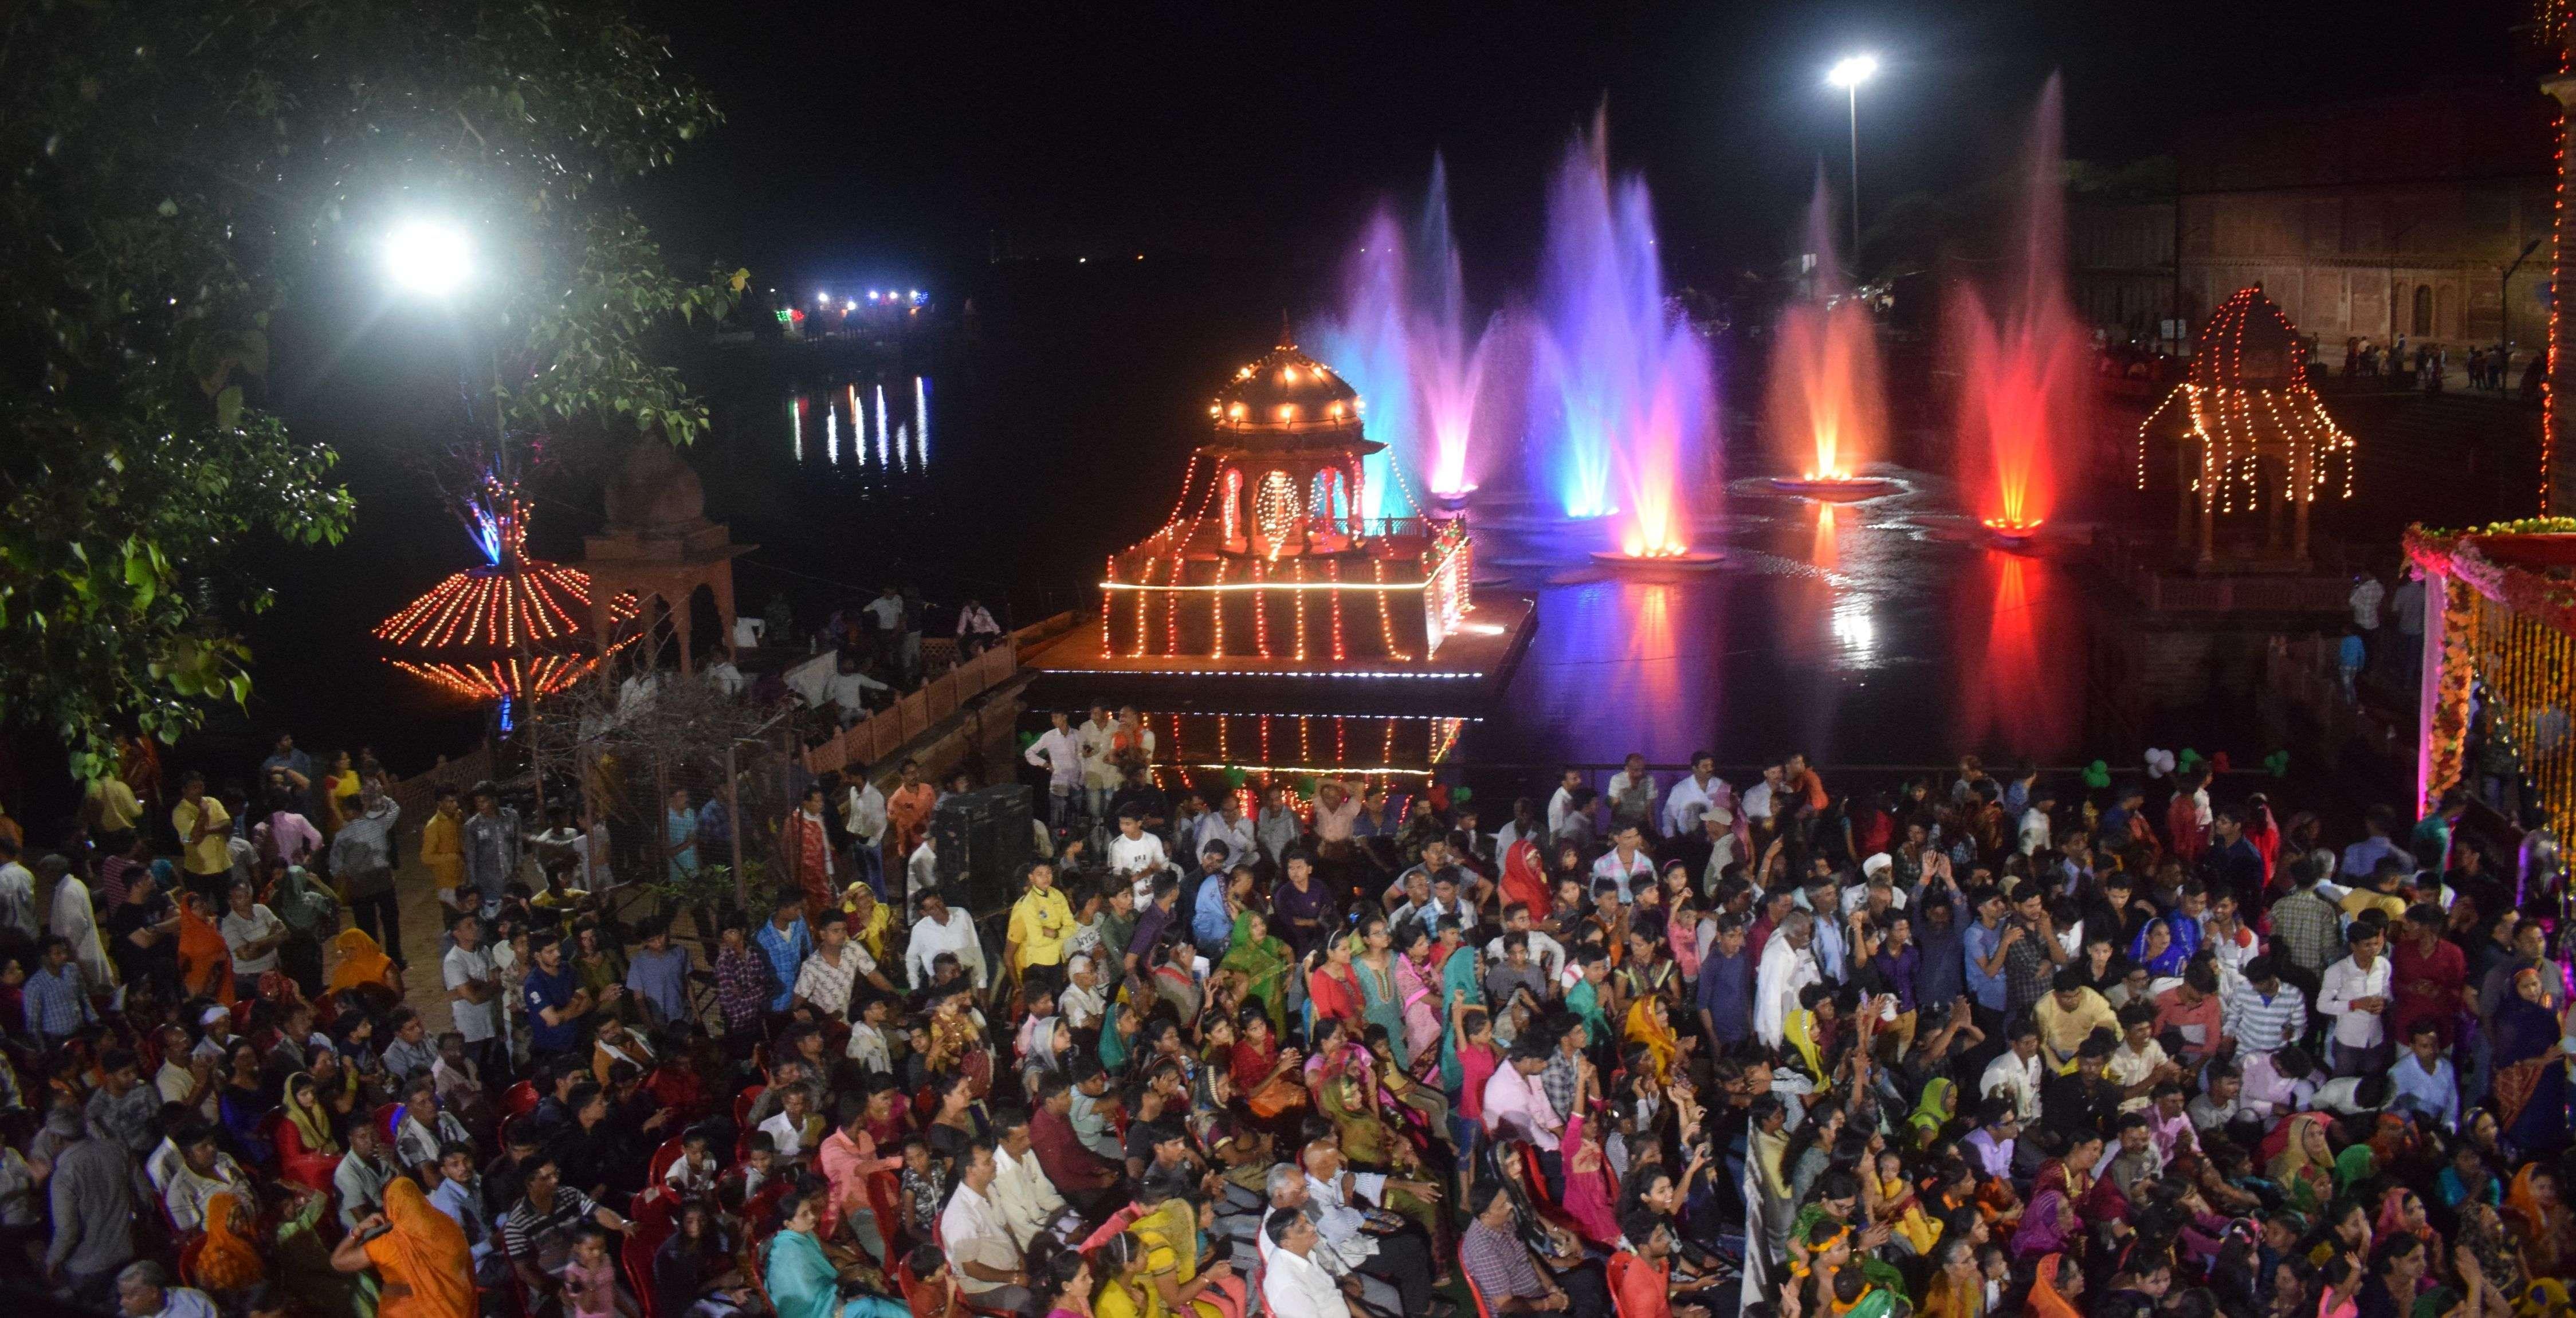 Tirtharaj Machkund illuminated with colored lights